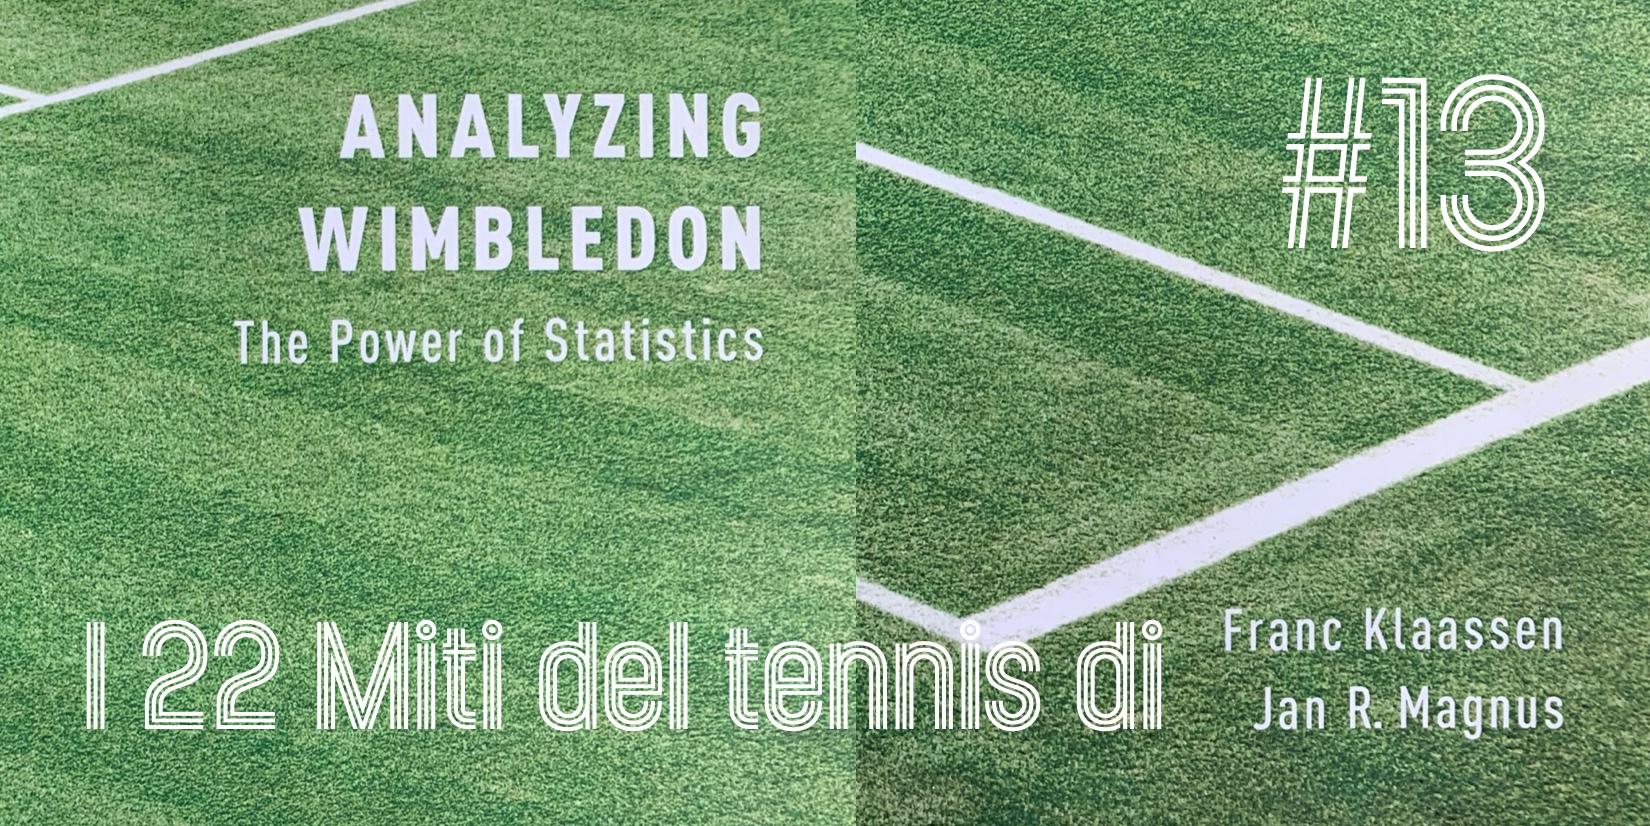 I 22 miti del tennis di Klaassen & Magnus – Mito 13 - settesei.it